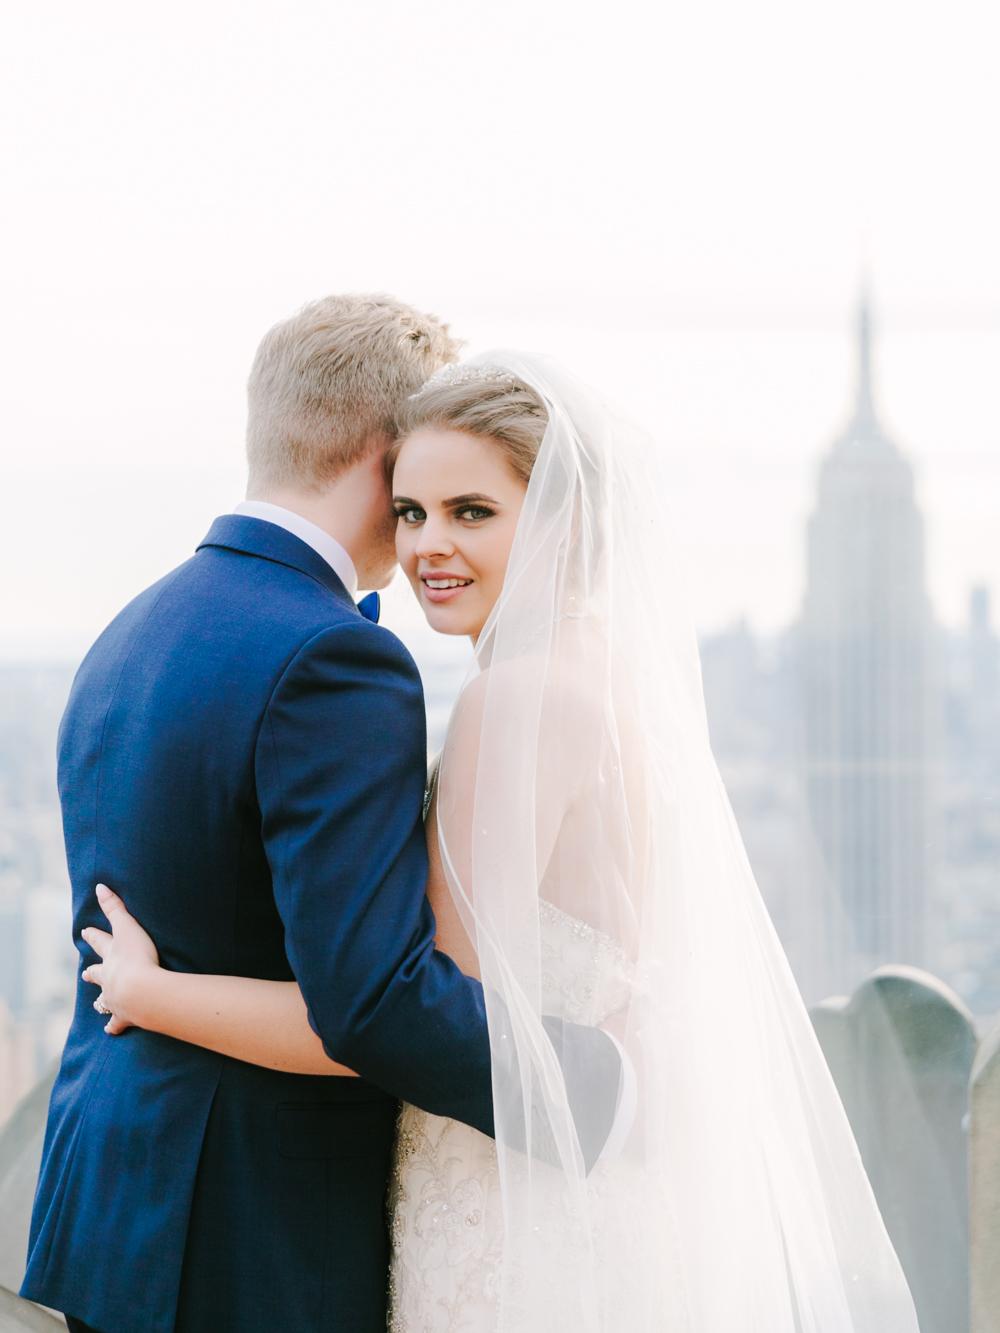 Wedding-Photography-by-Tanya-Isaeva-81.jpg